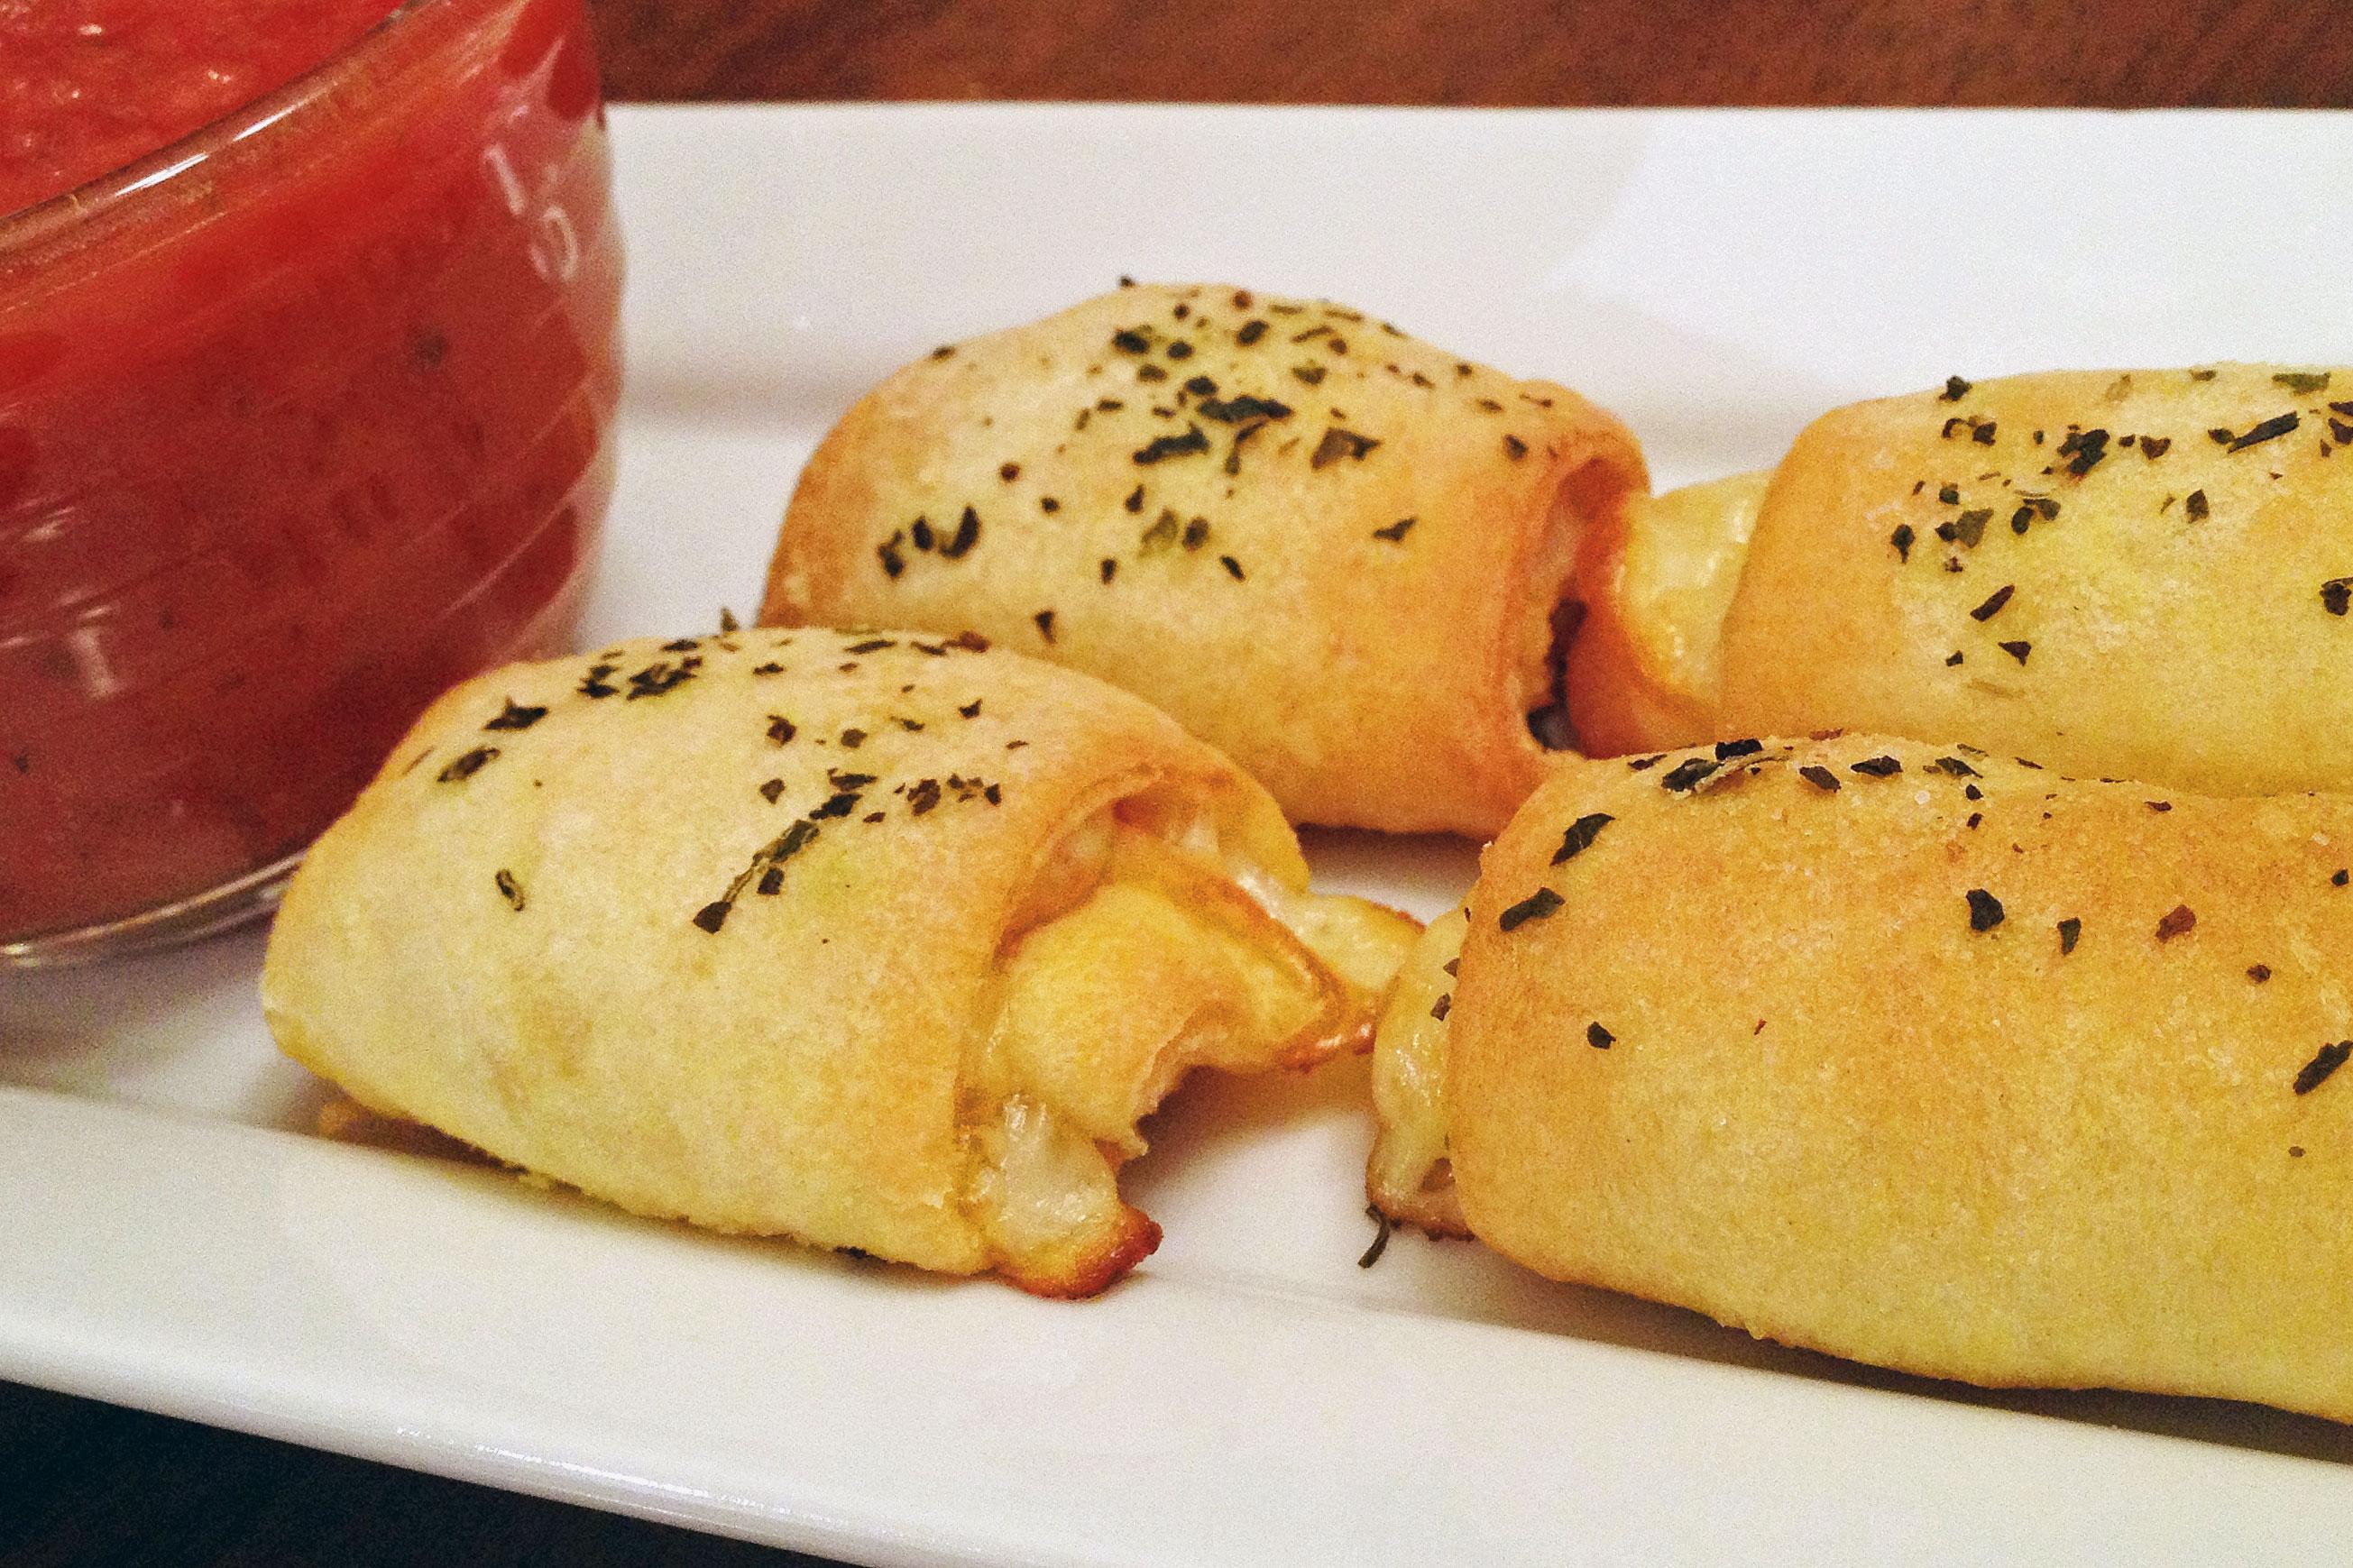 Pepperoni Rolls and marinara sauce